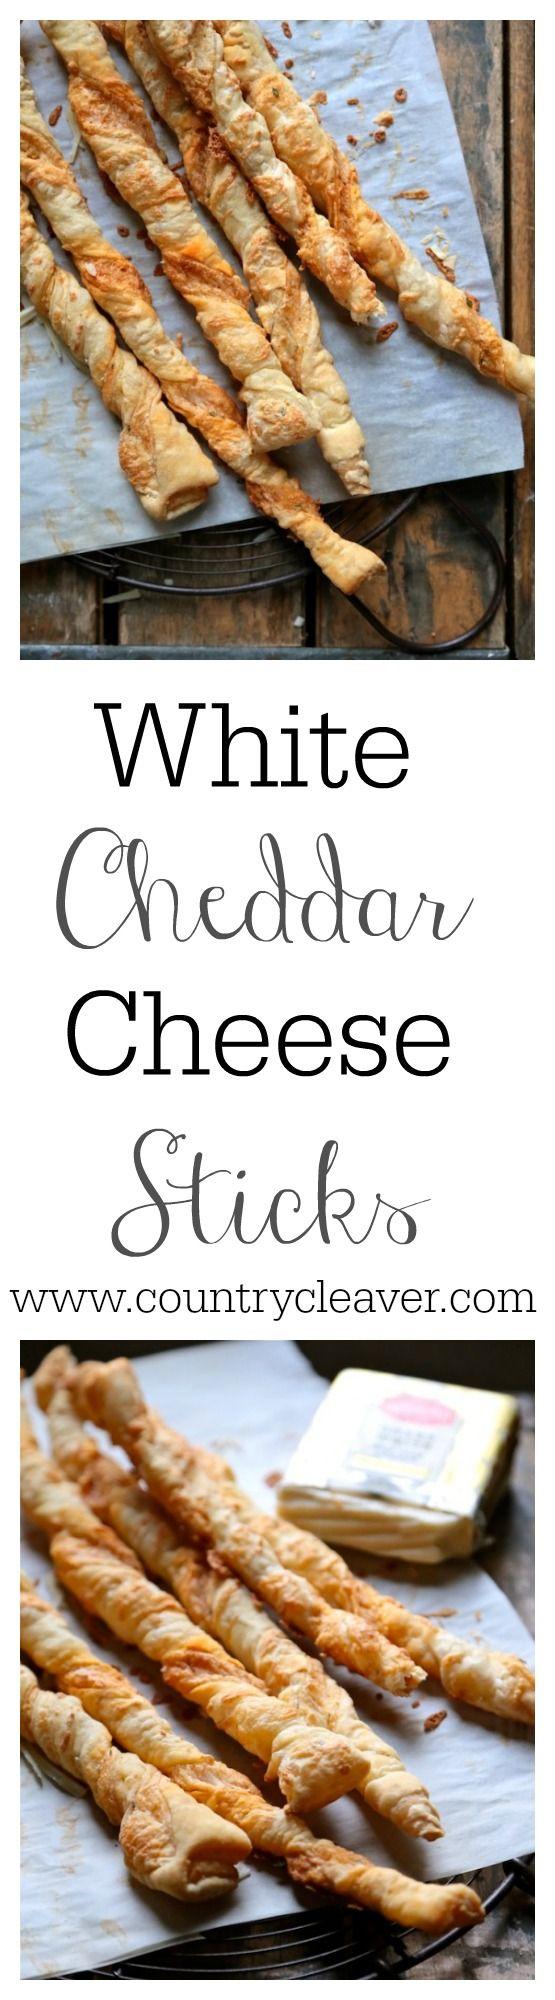 White Cheddar Cheese Sticks